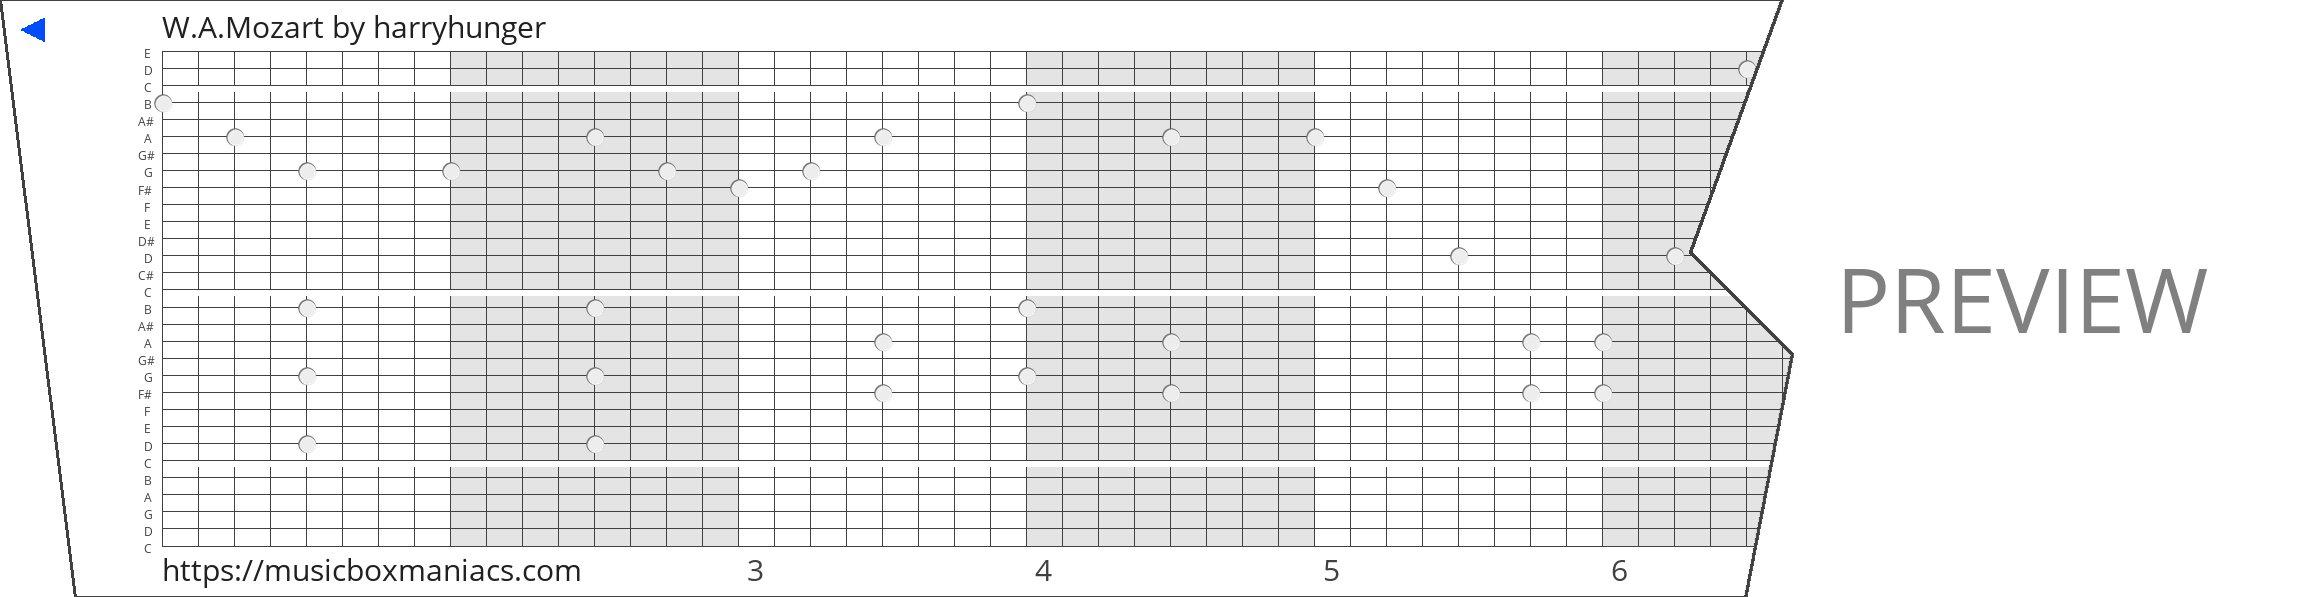 W.A.Mozart 30 note music box paper strip